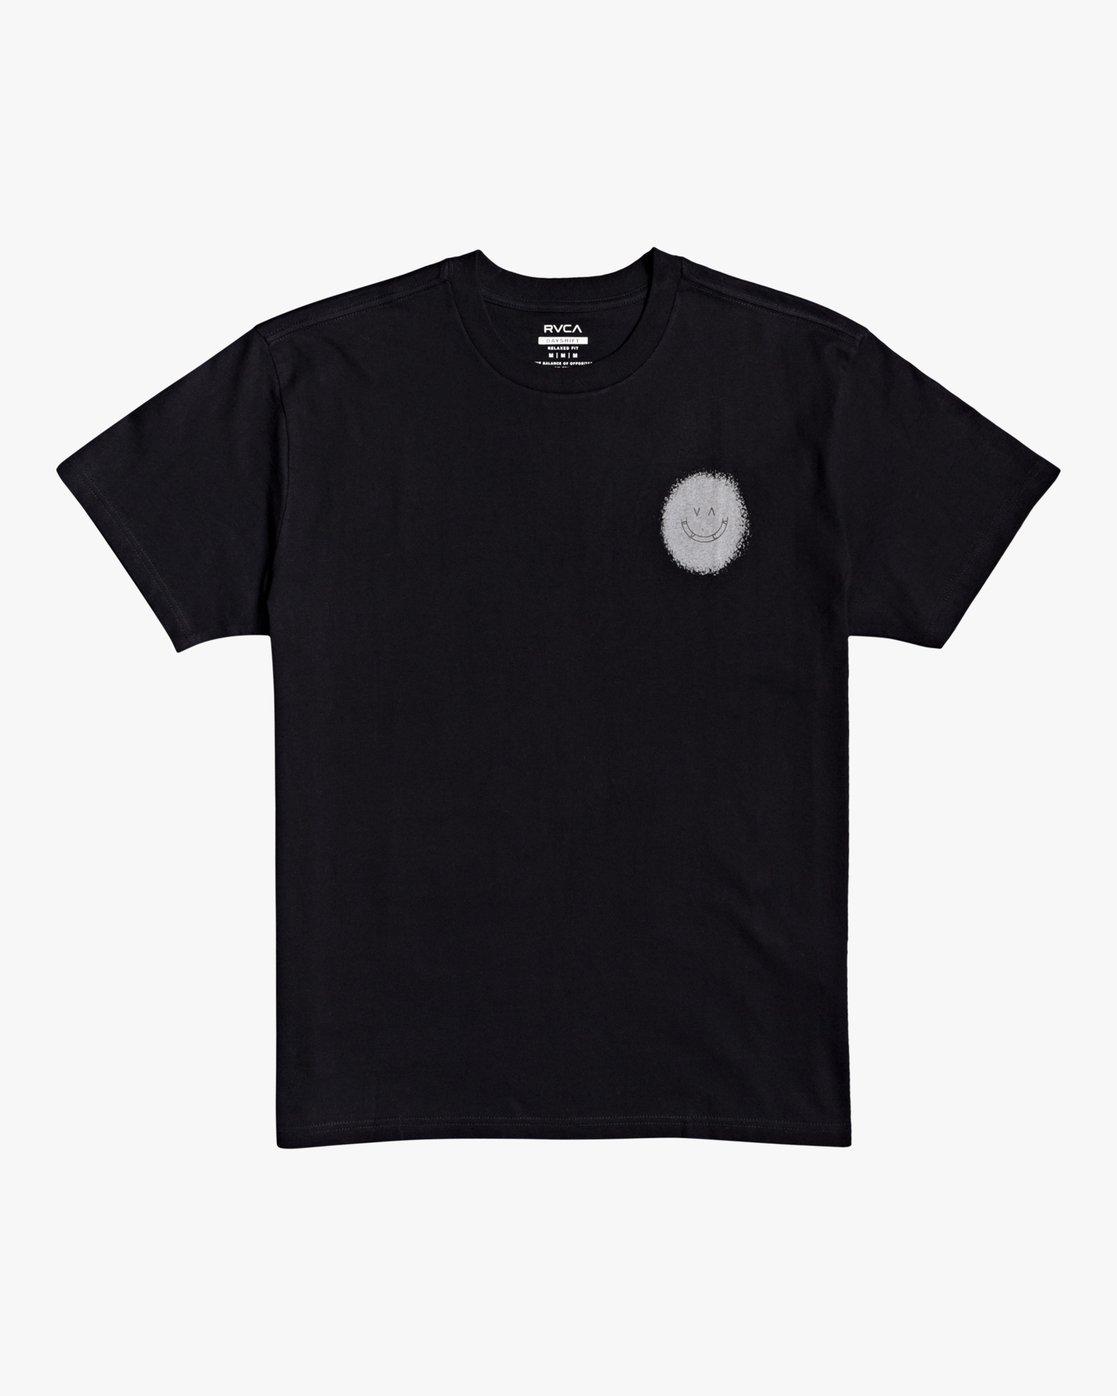 0 Benjamin JeanJean Skulls And Roses - T-Shirt for Men Black U1SSSSRVF0 RVCA